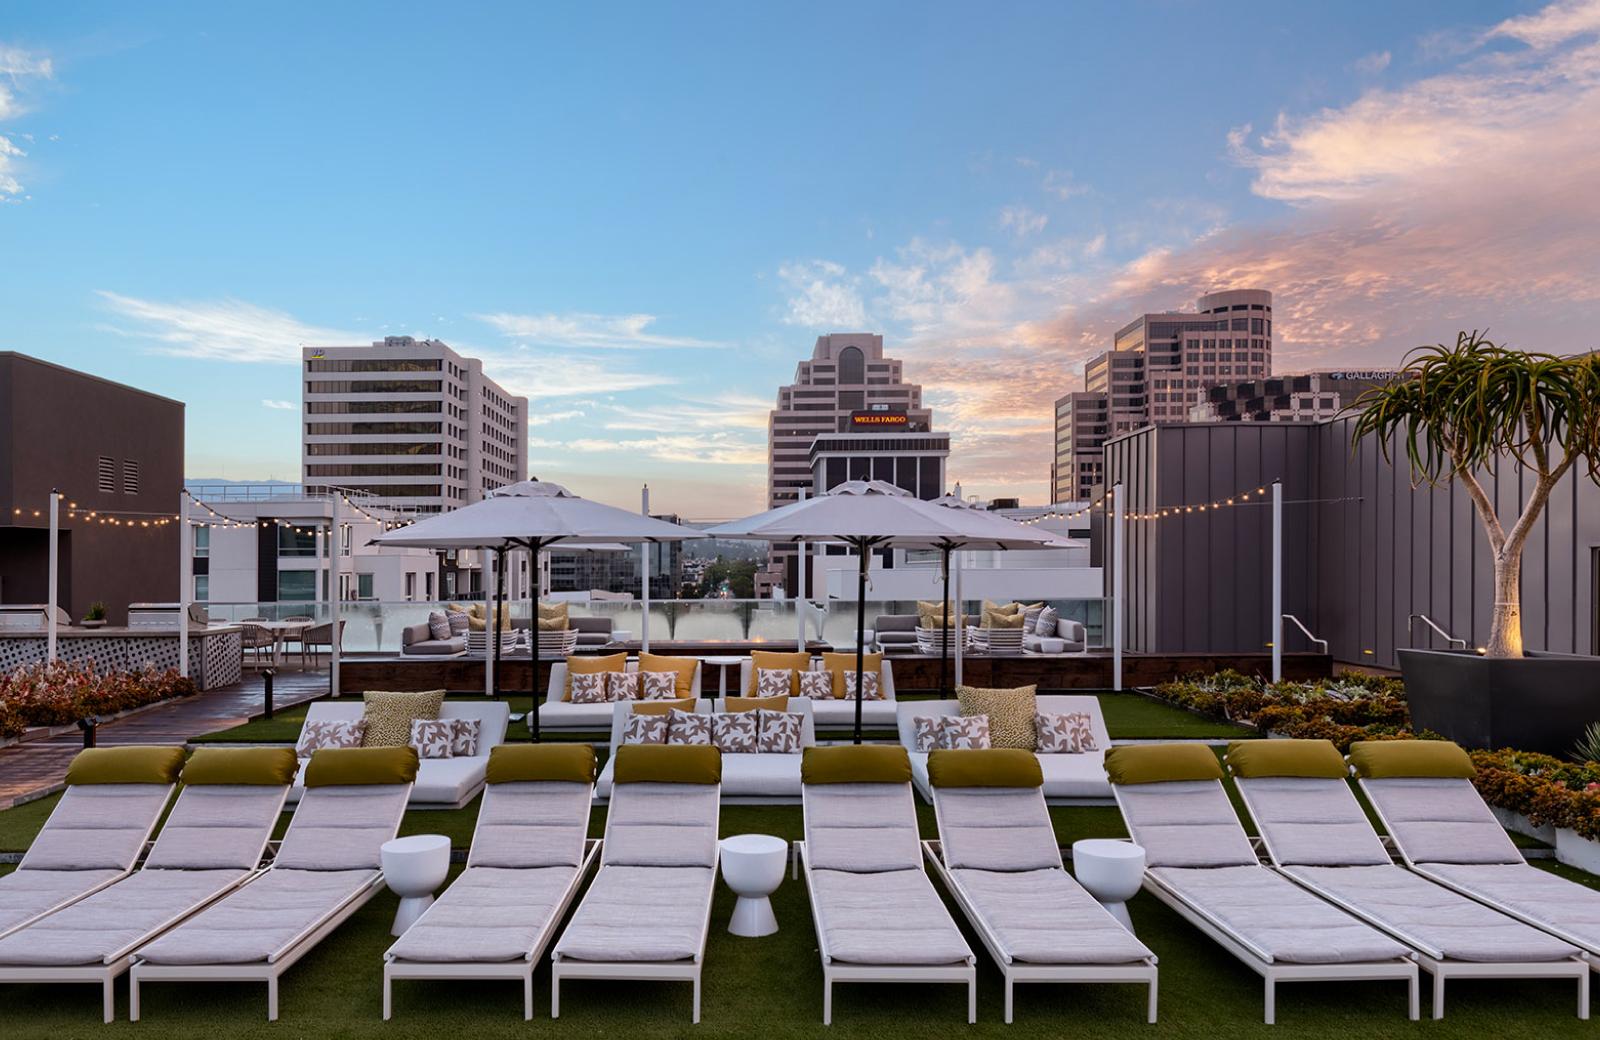 Pool Lounges - Altana Apts Glendale